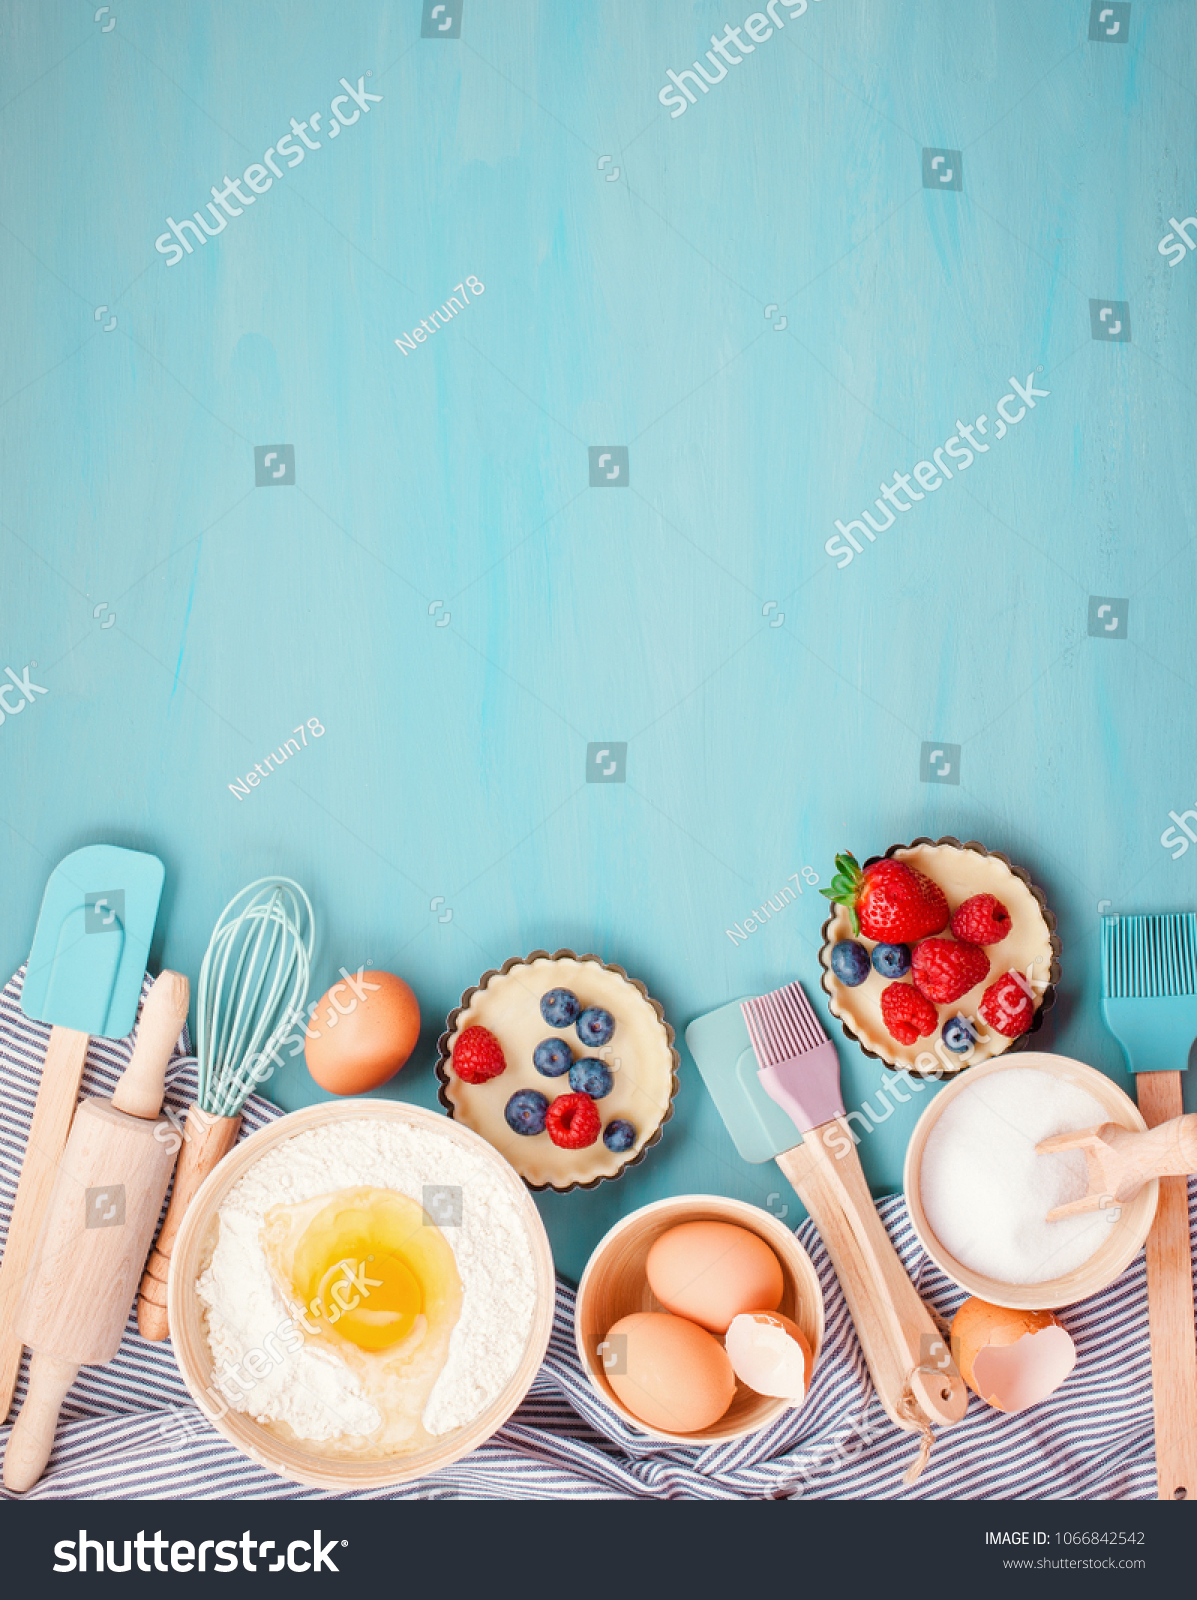 Baking Utensils Cooking Ingredients Tarts Cookies Stock Photo (Edit ...